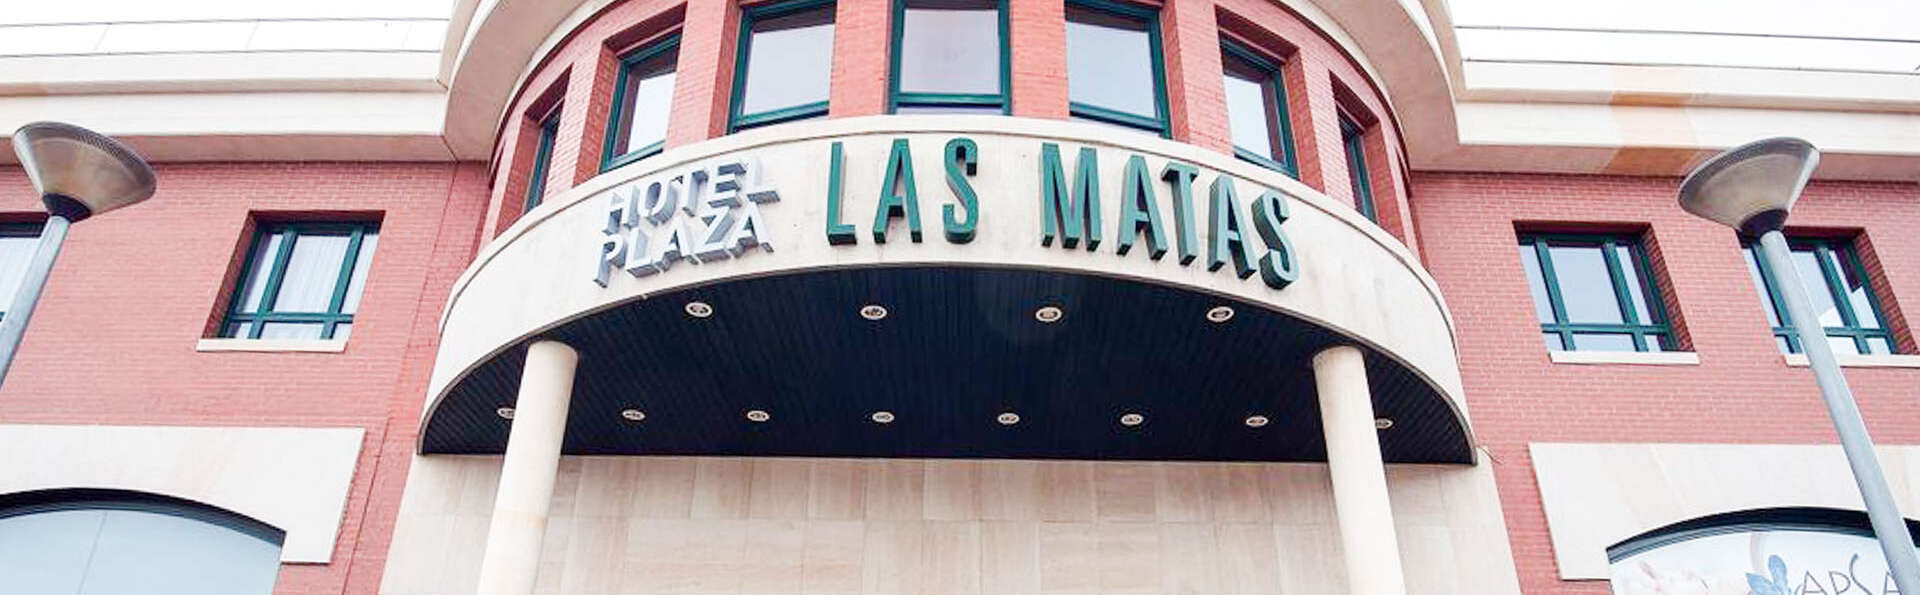 Plaza Las Matas Hotel - EDIT_WEB_FRONT.jpg